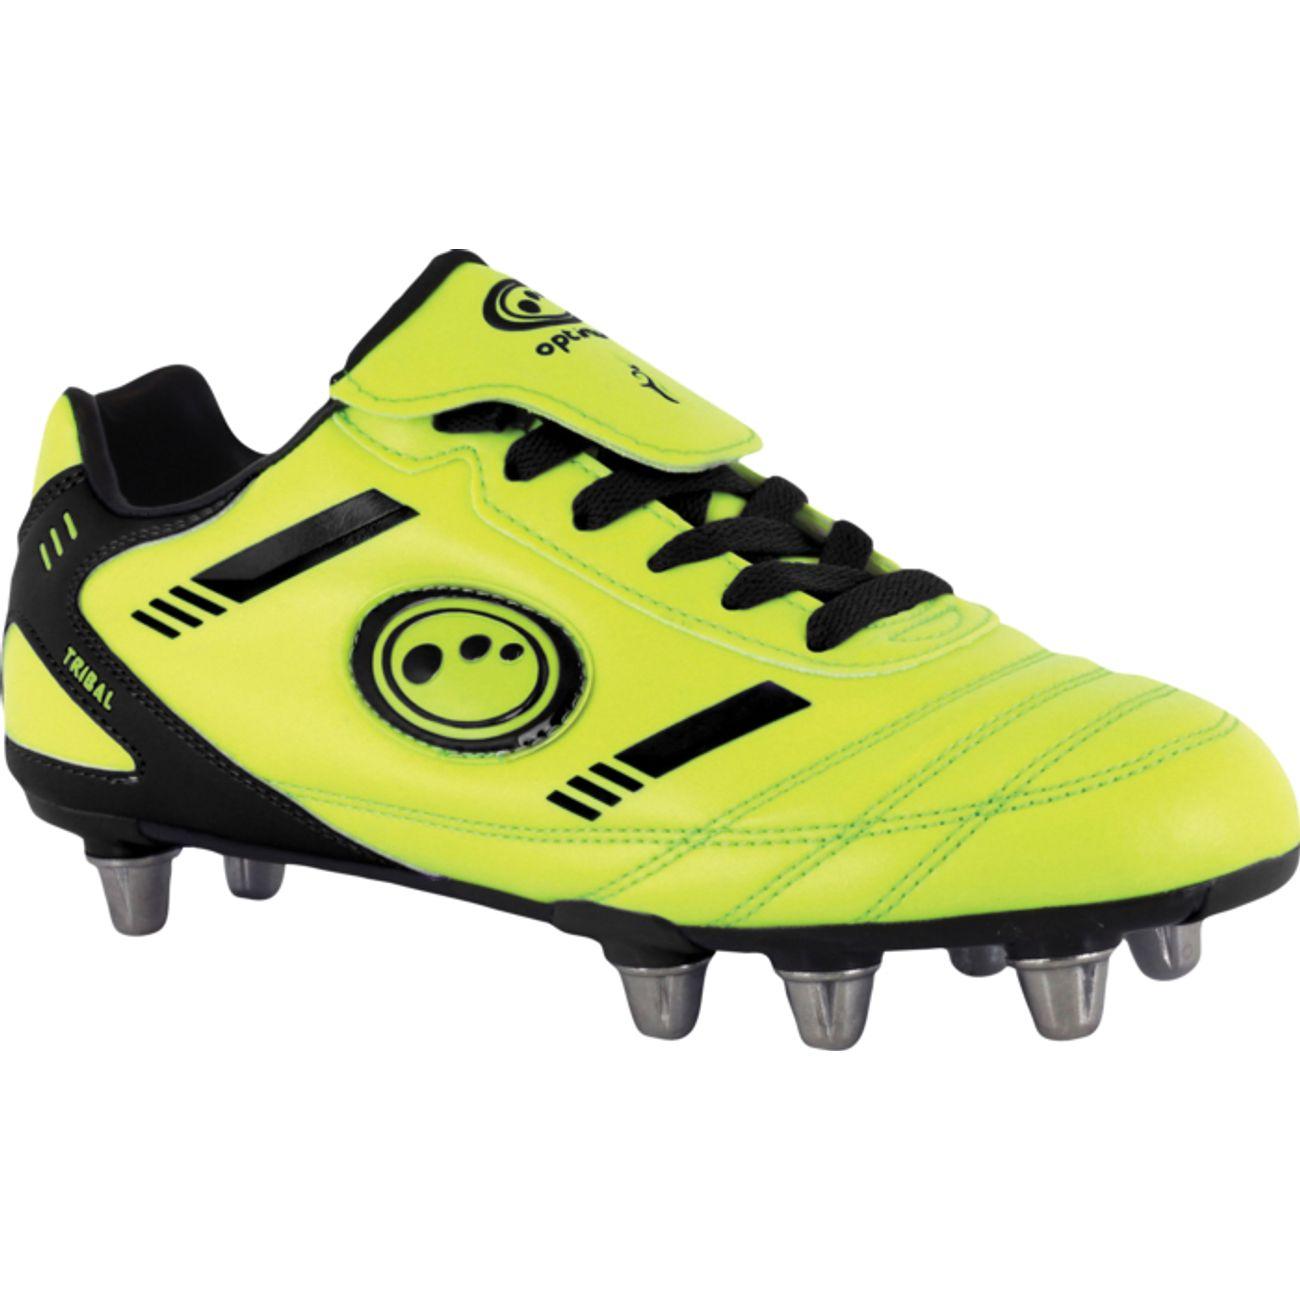 Optimum Jne Ah15 Sg Chaussures Tribal Boots wkXiOPZuT